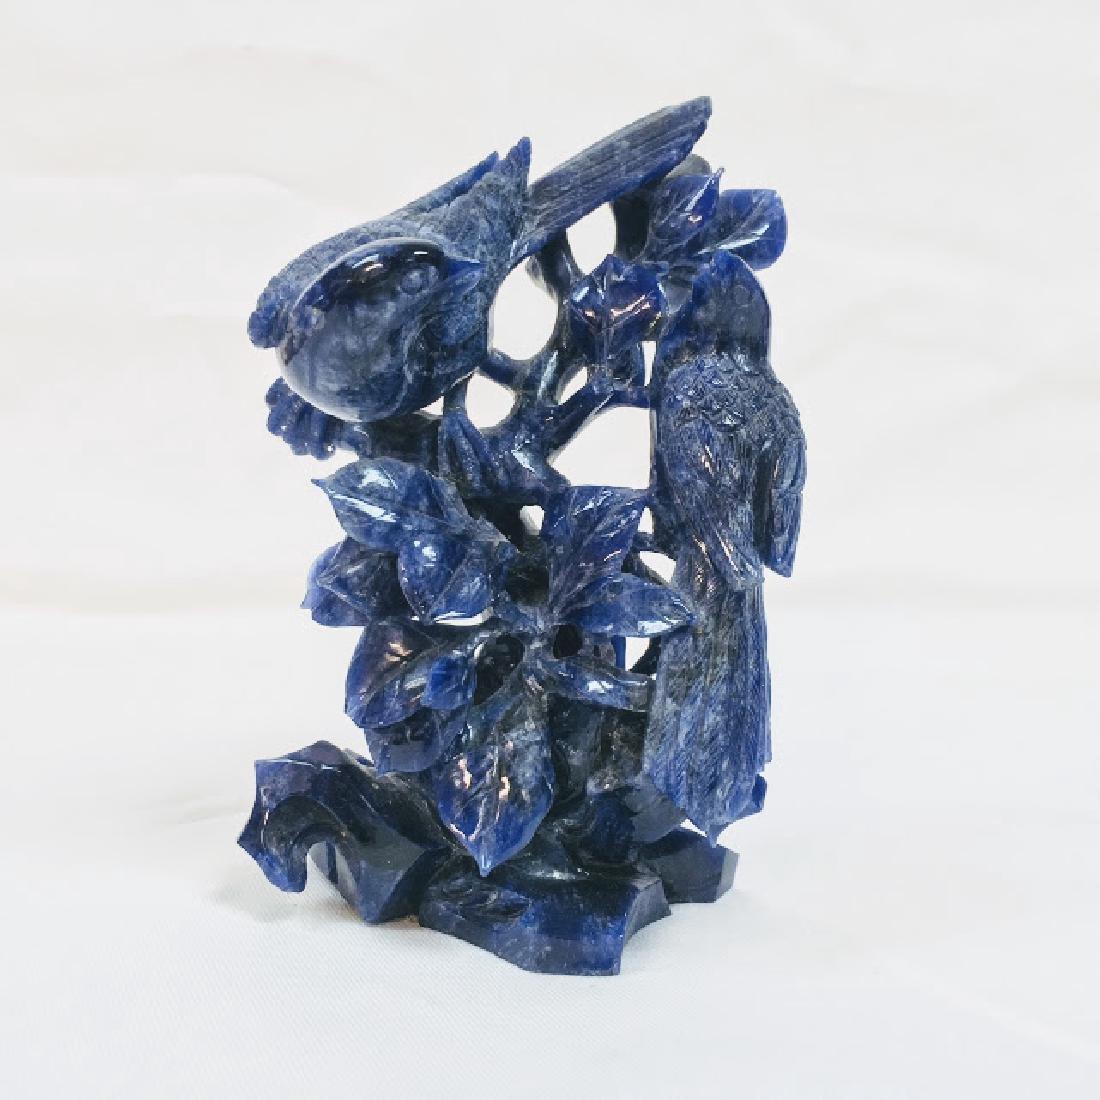 Antique Chinese lapis lazuli, grouped birds scene - 5